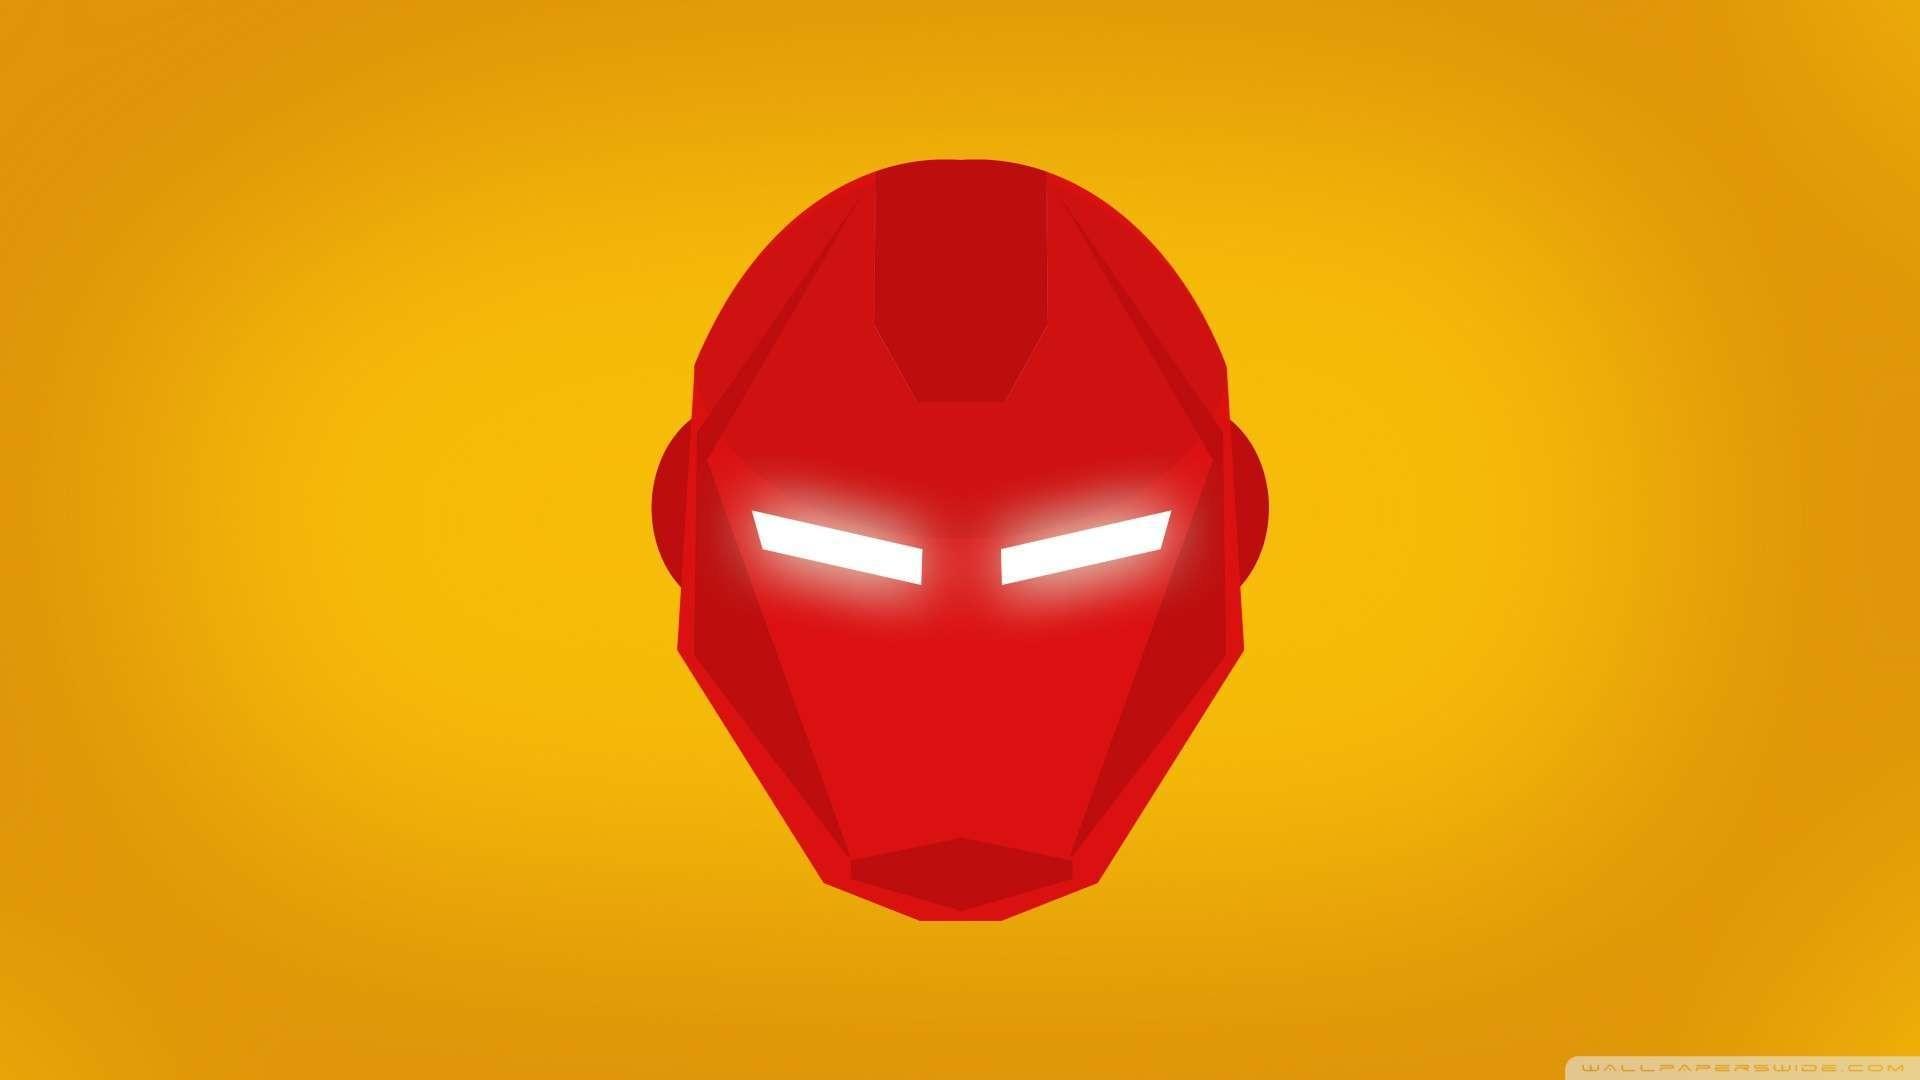 Iron Man 26 Wallpaper 1080p HD